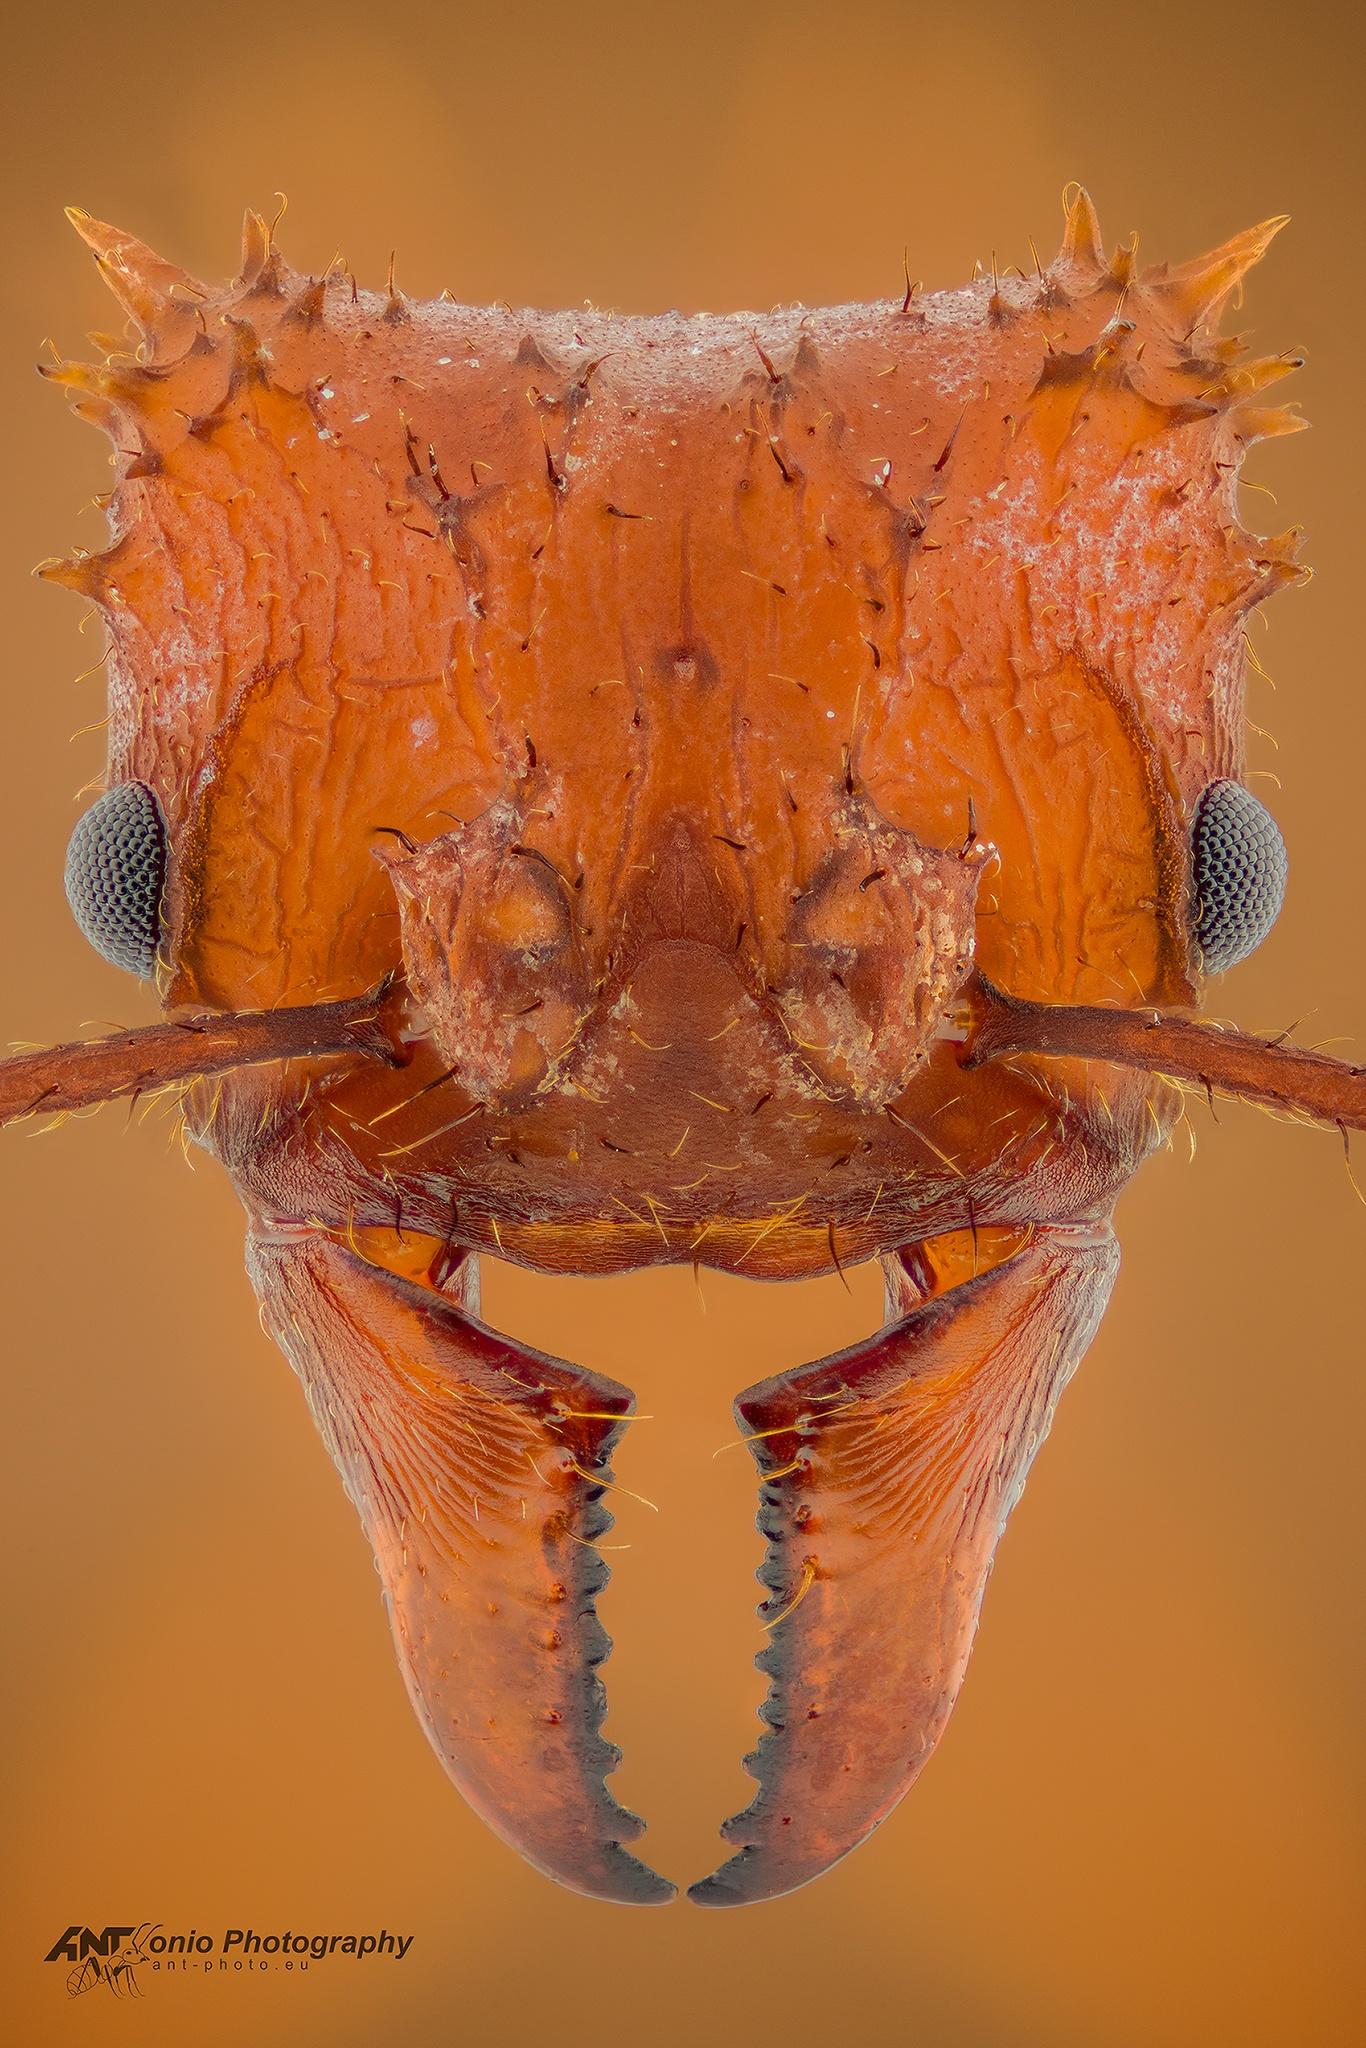 Ant Acromyrmex octospinosus head